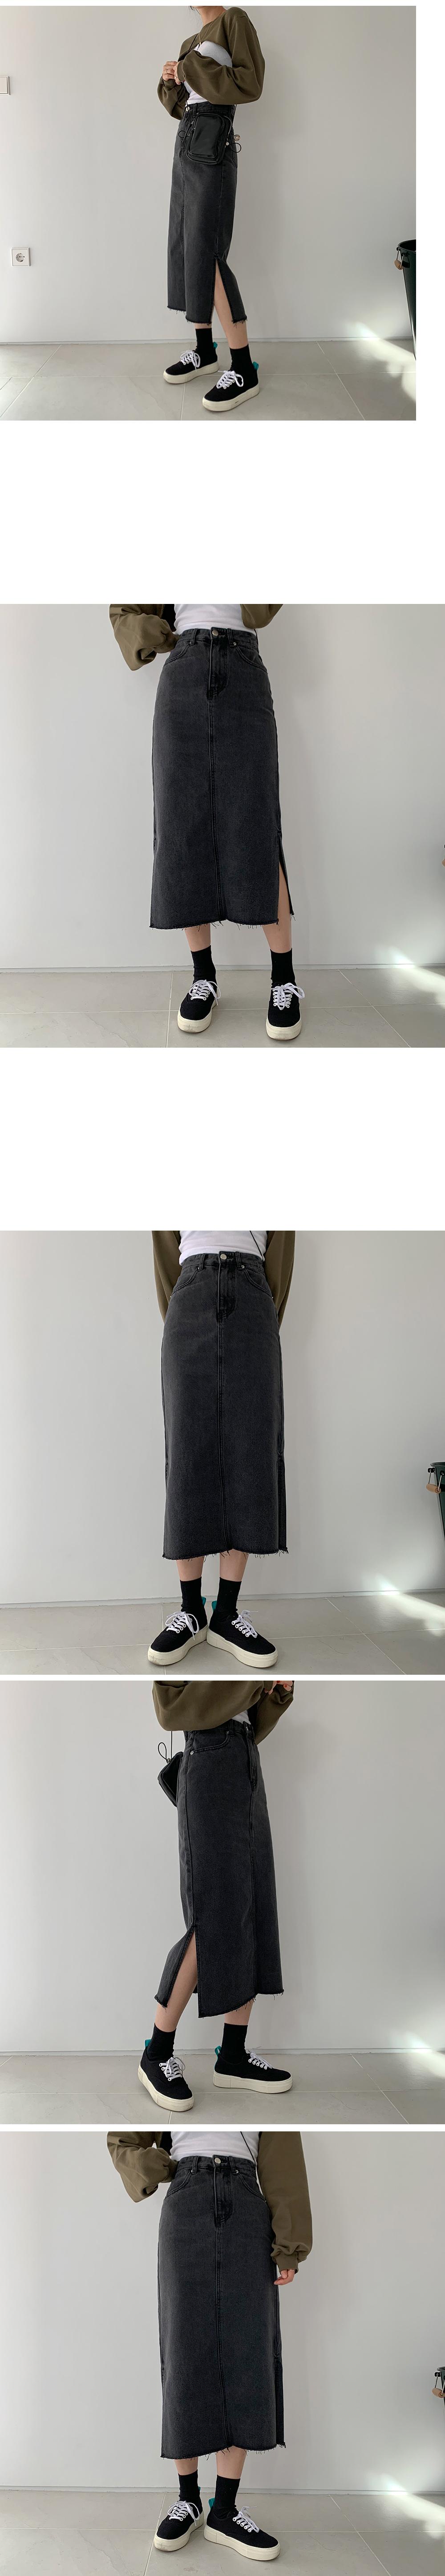 Dean side split cut denim long skirt